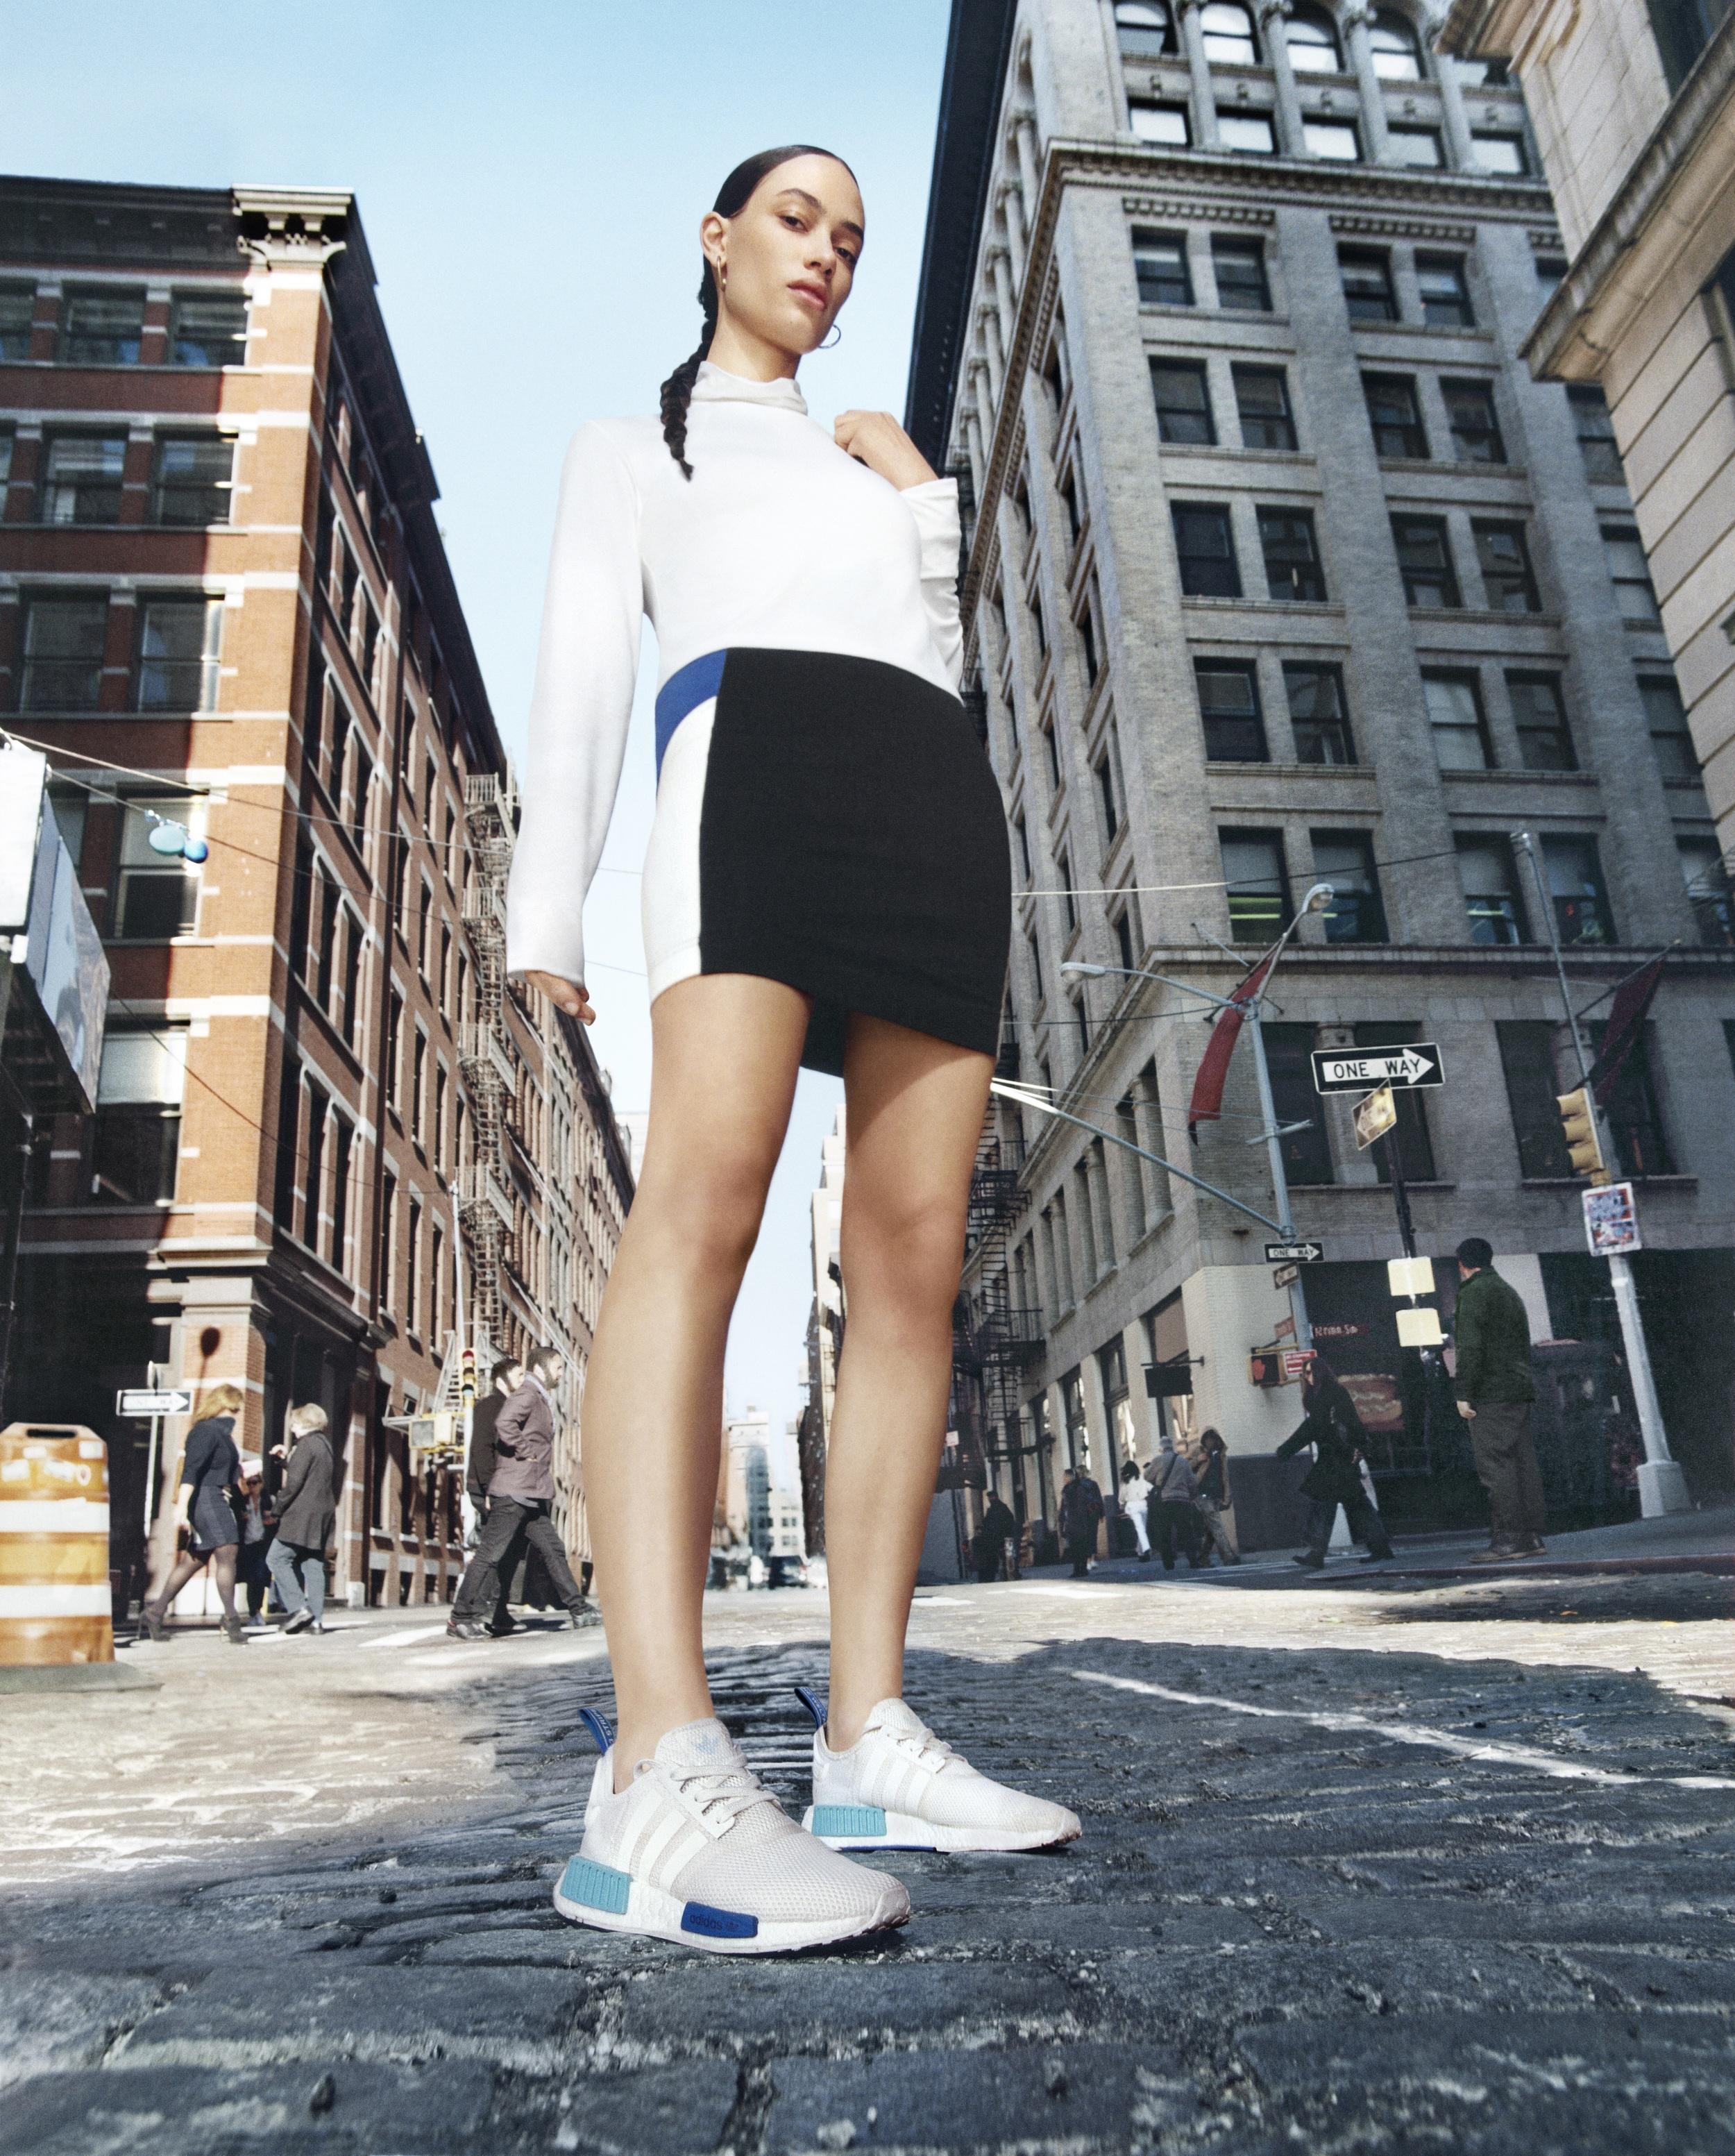 Adidas NMD Runner Woman